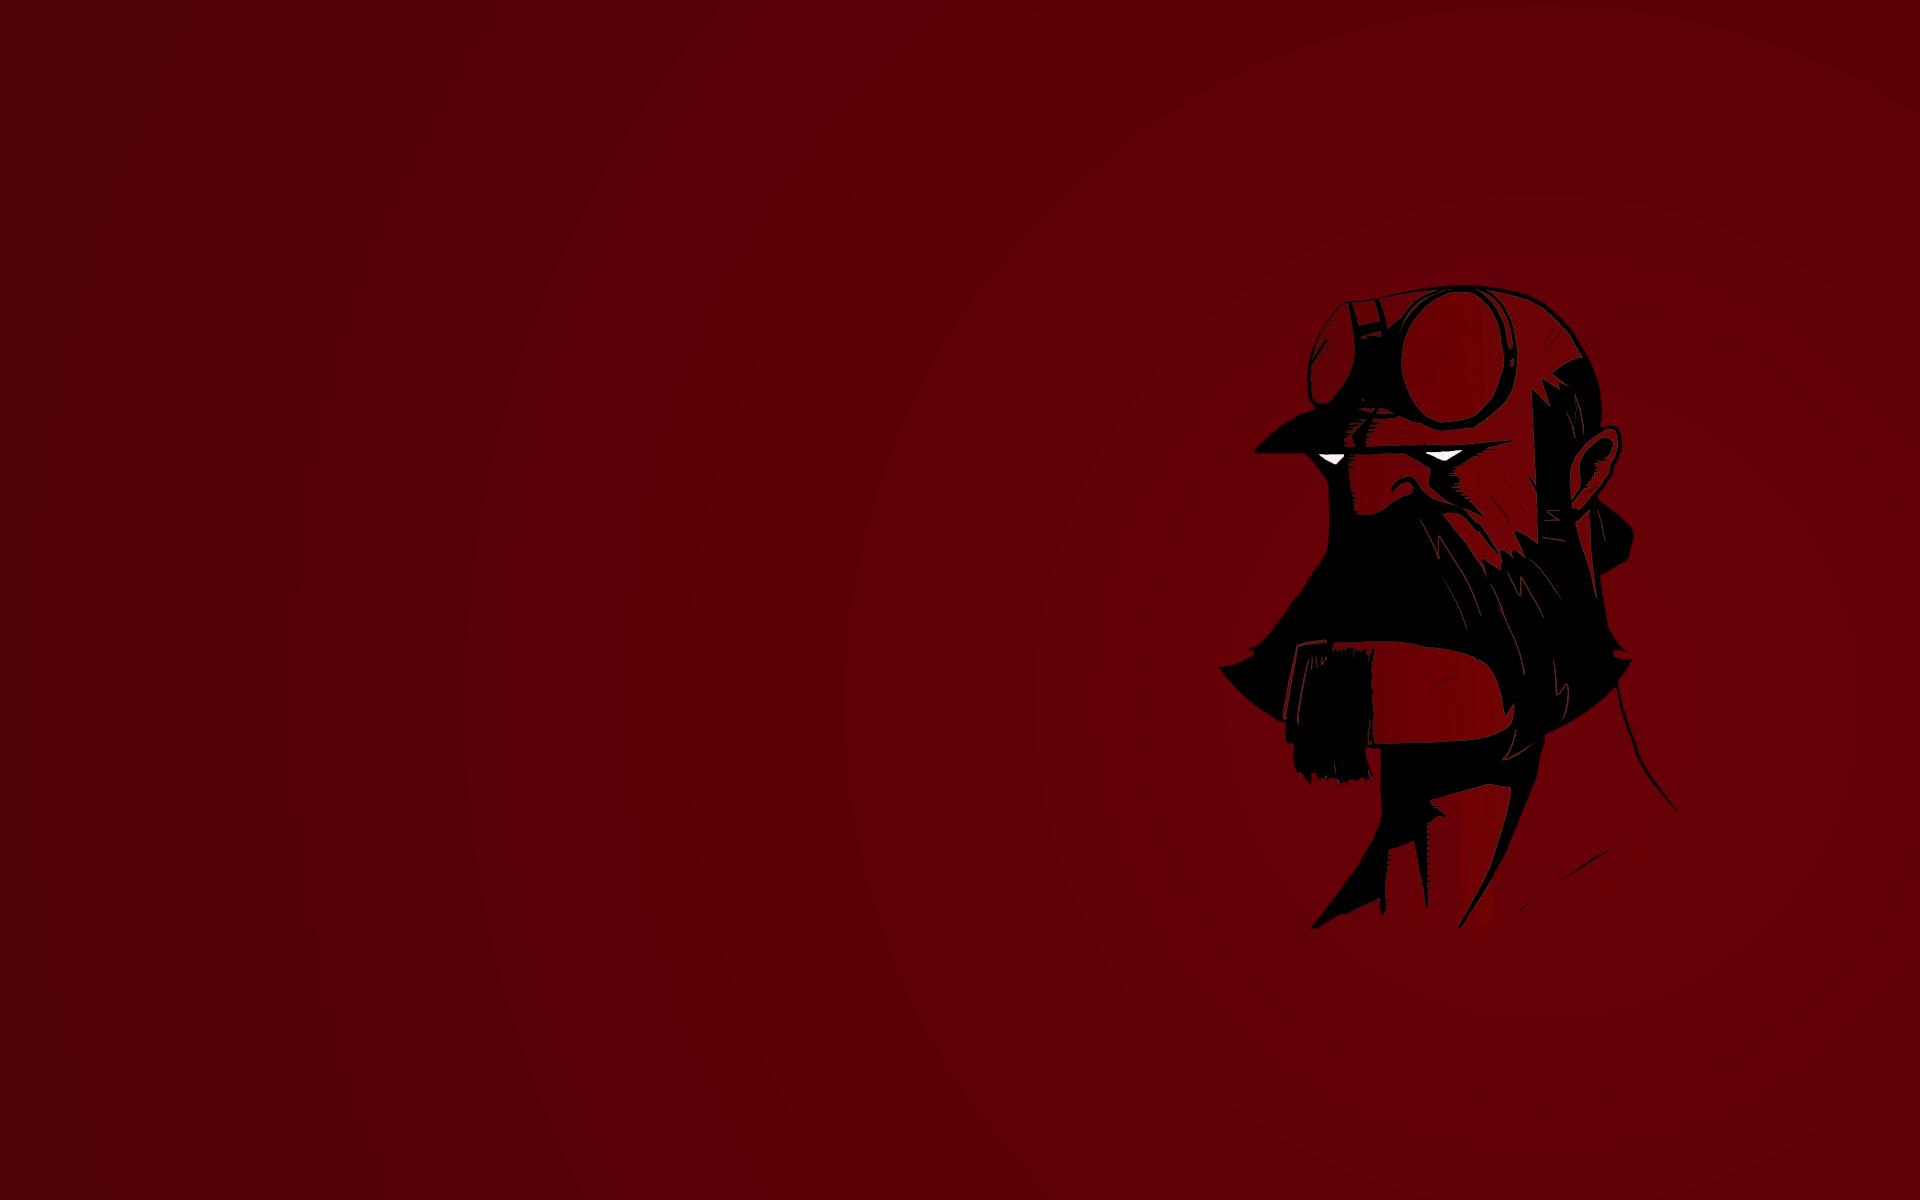 Bearded Hellboy Wallpaper by Affubalator 1920x1200